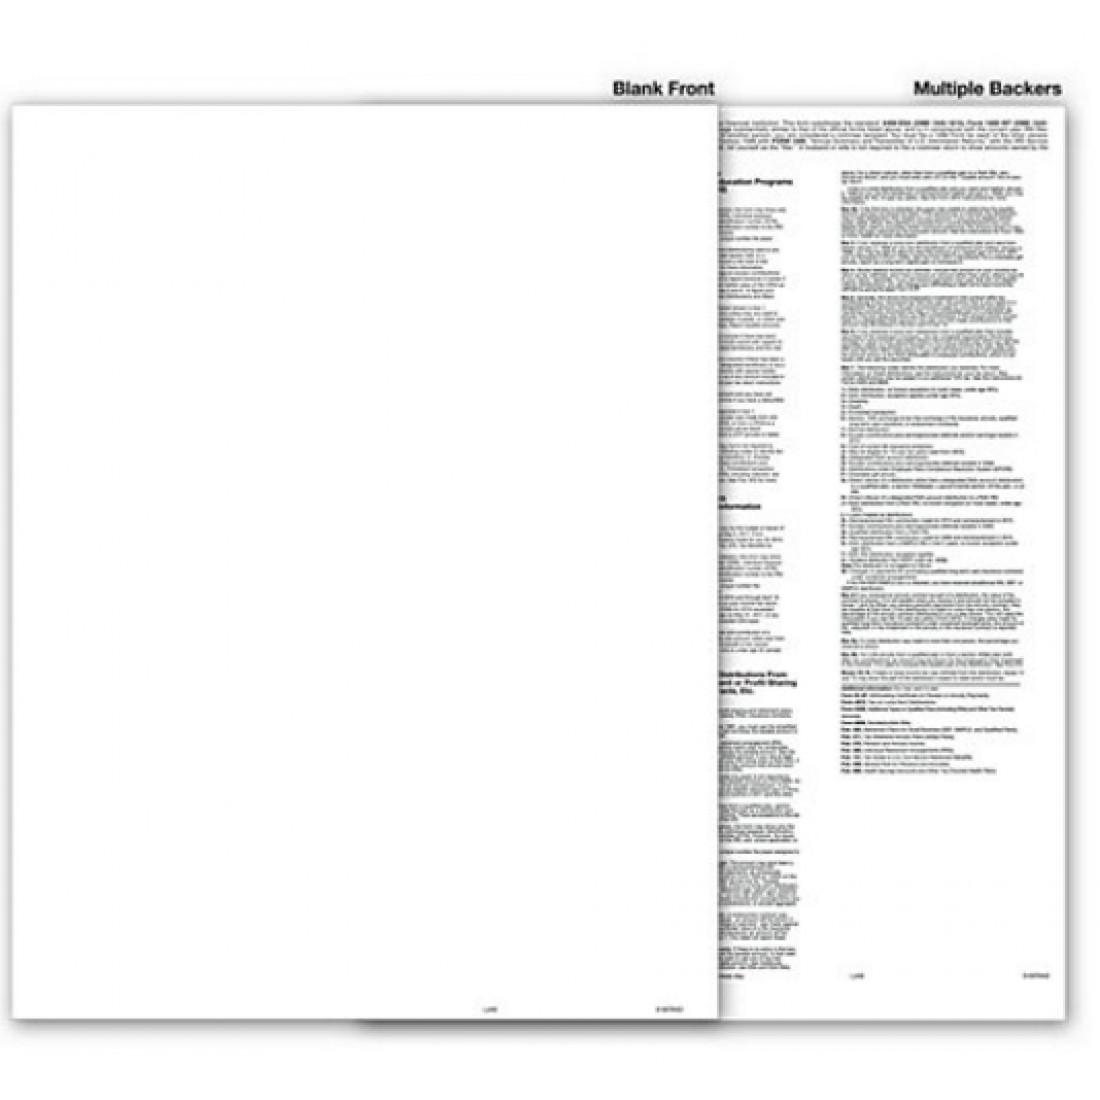 Blank 1099 Tax Form